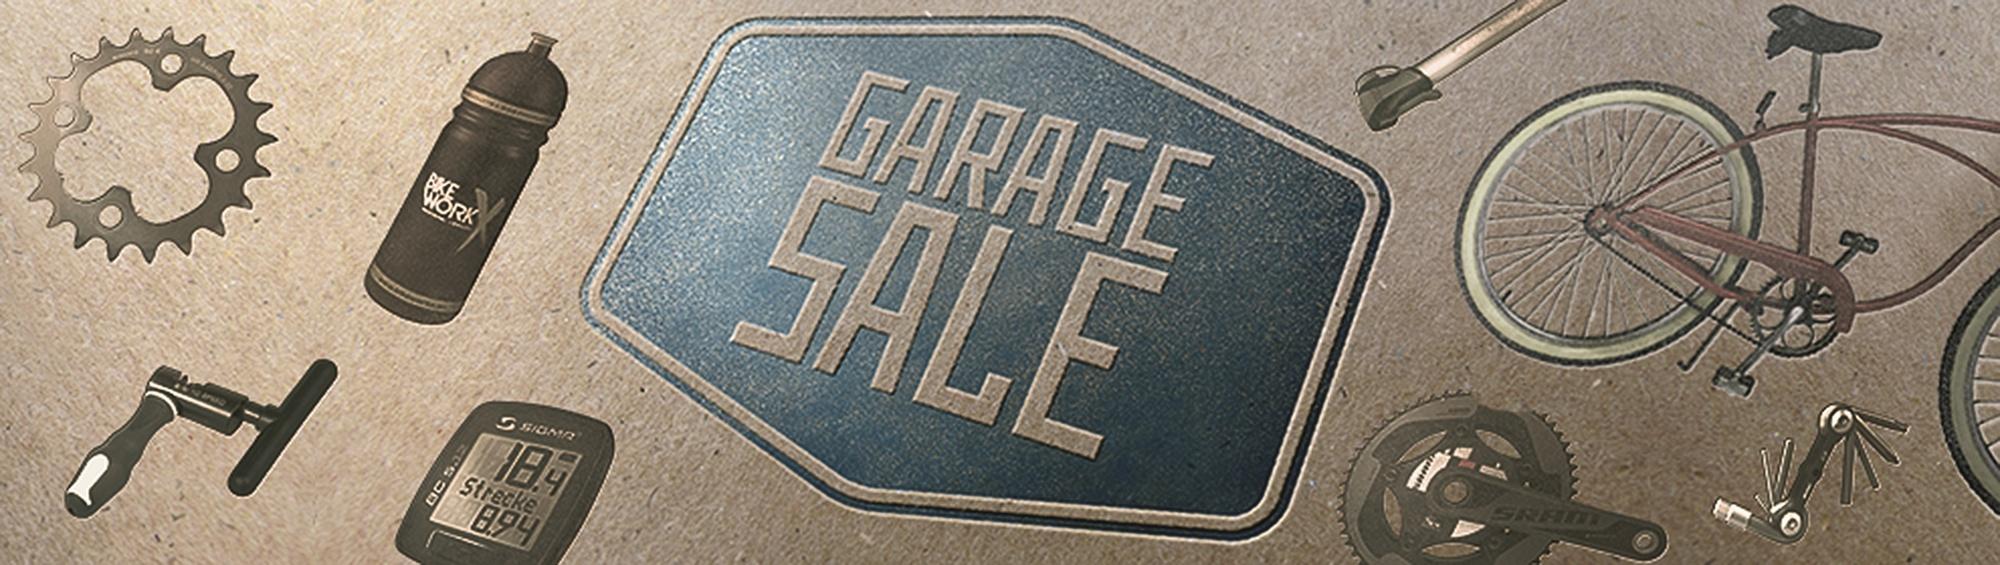 garage-poster.jpg